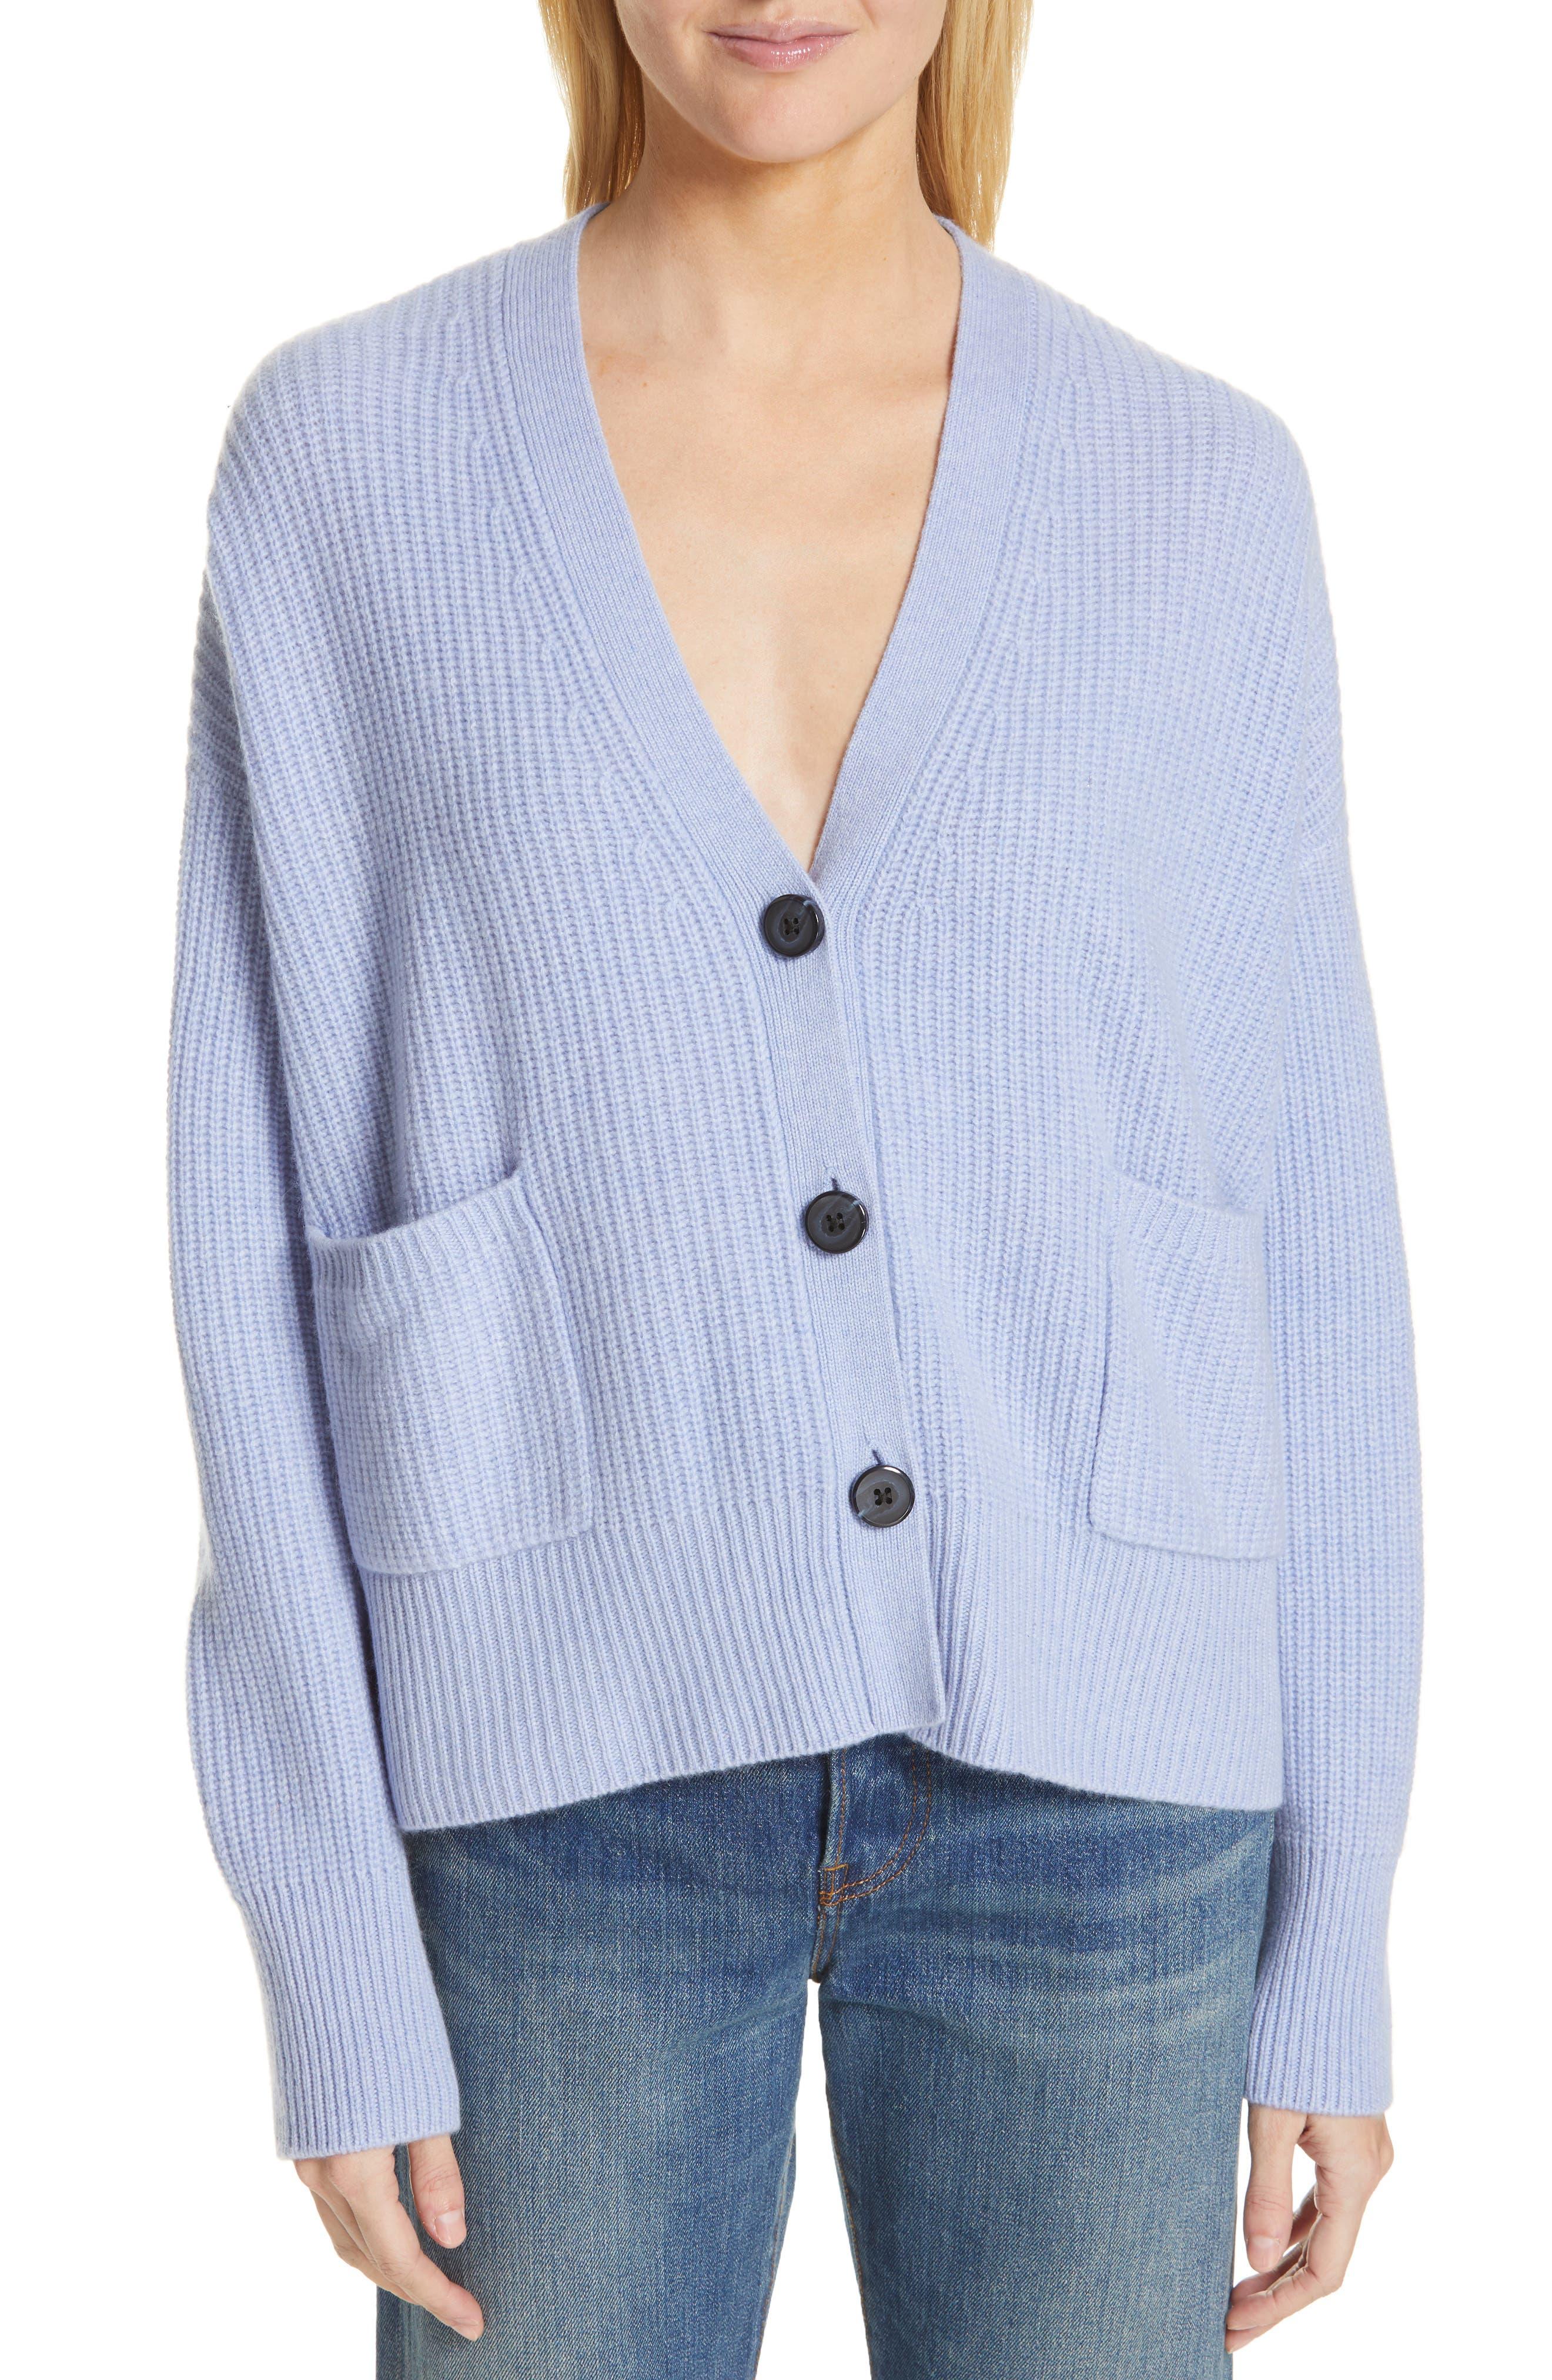 NORDSTROM SIGNATURE, Cashmere Pocket Cardigan, Main thumbnail 1, color, BLUE LUSTRE HEATHER